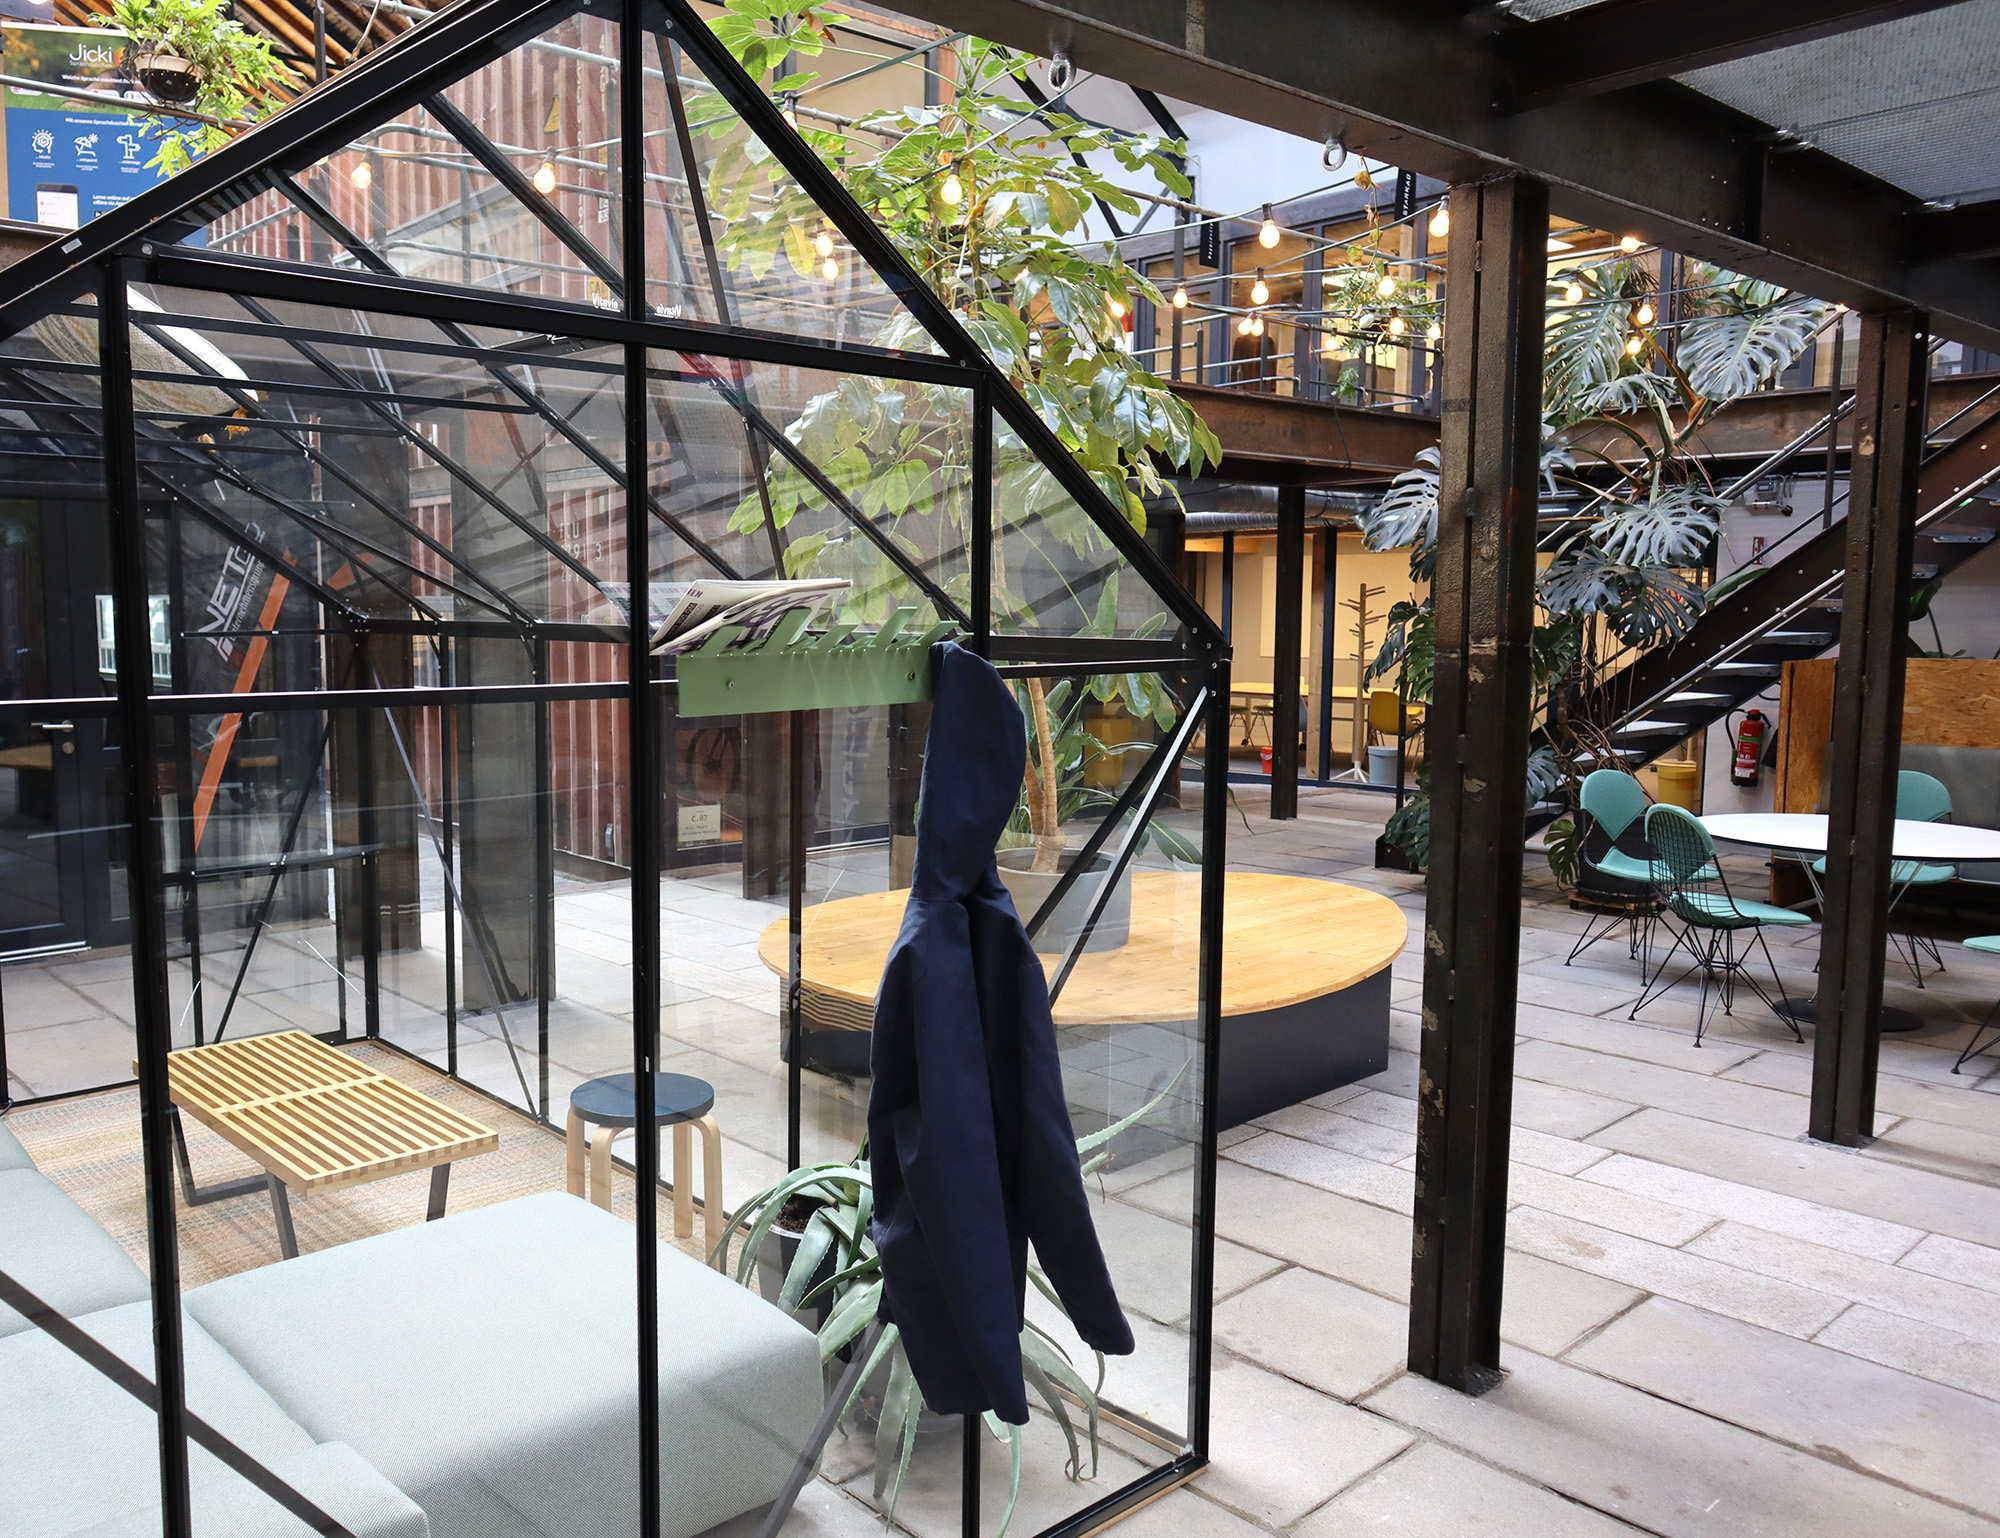 R_S_IMG_0919_Quer_OBE_Garderobe_Design_Stadtteile